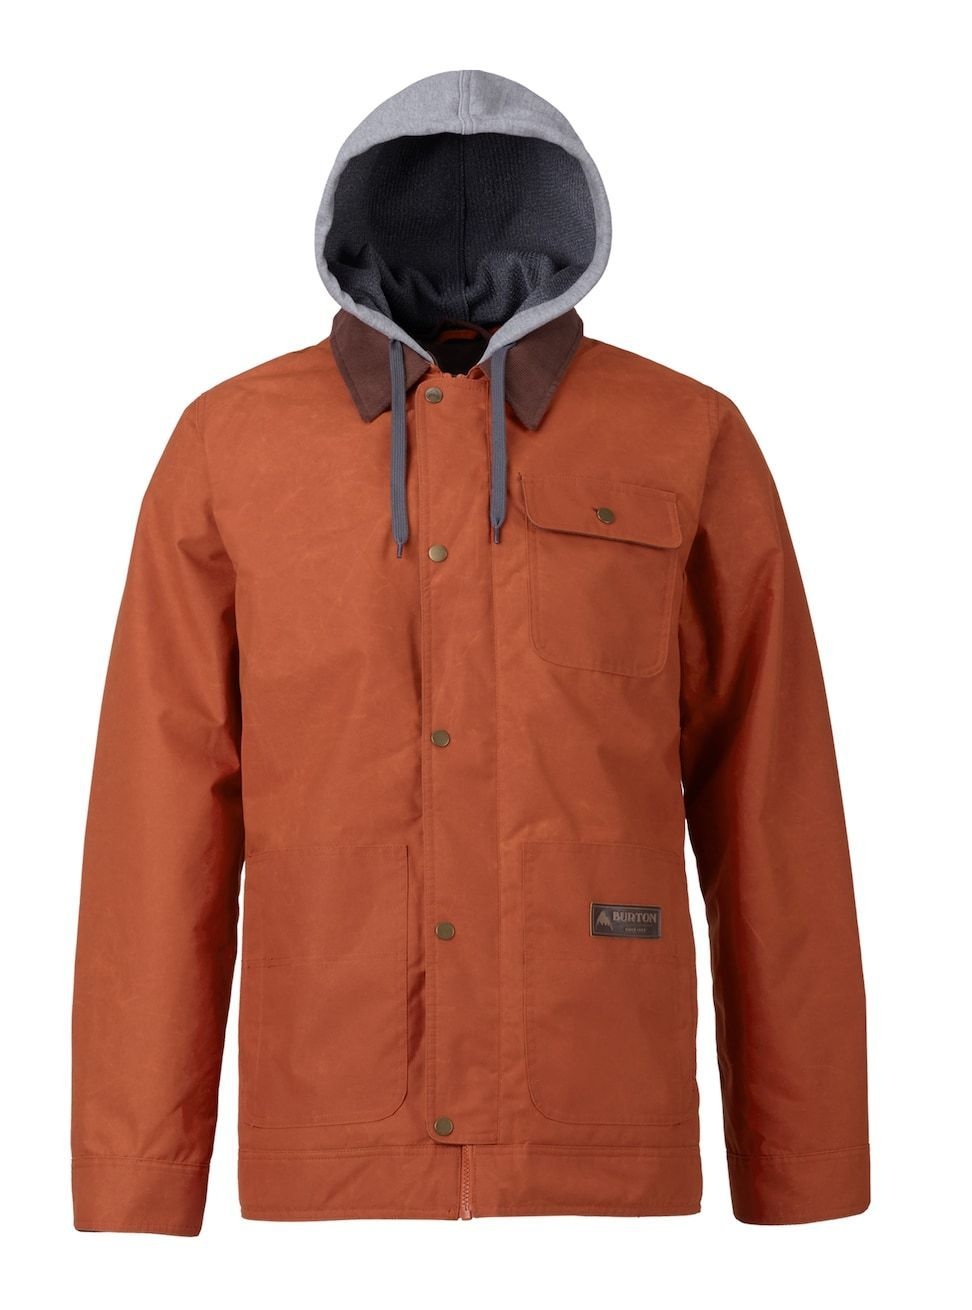 0531b87e0a Burton Mens DUNMORE JACKET CLAY 2018 | Products | Jackets